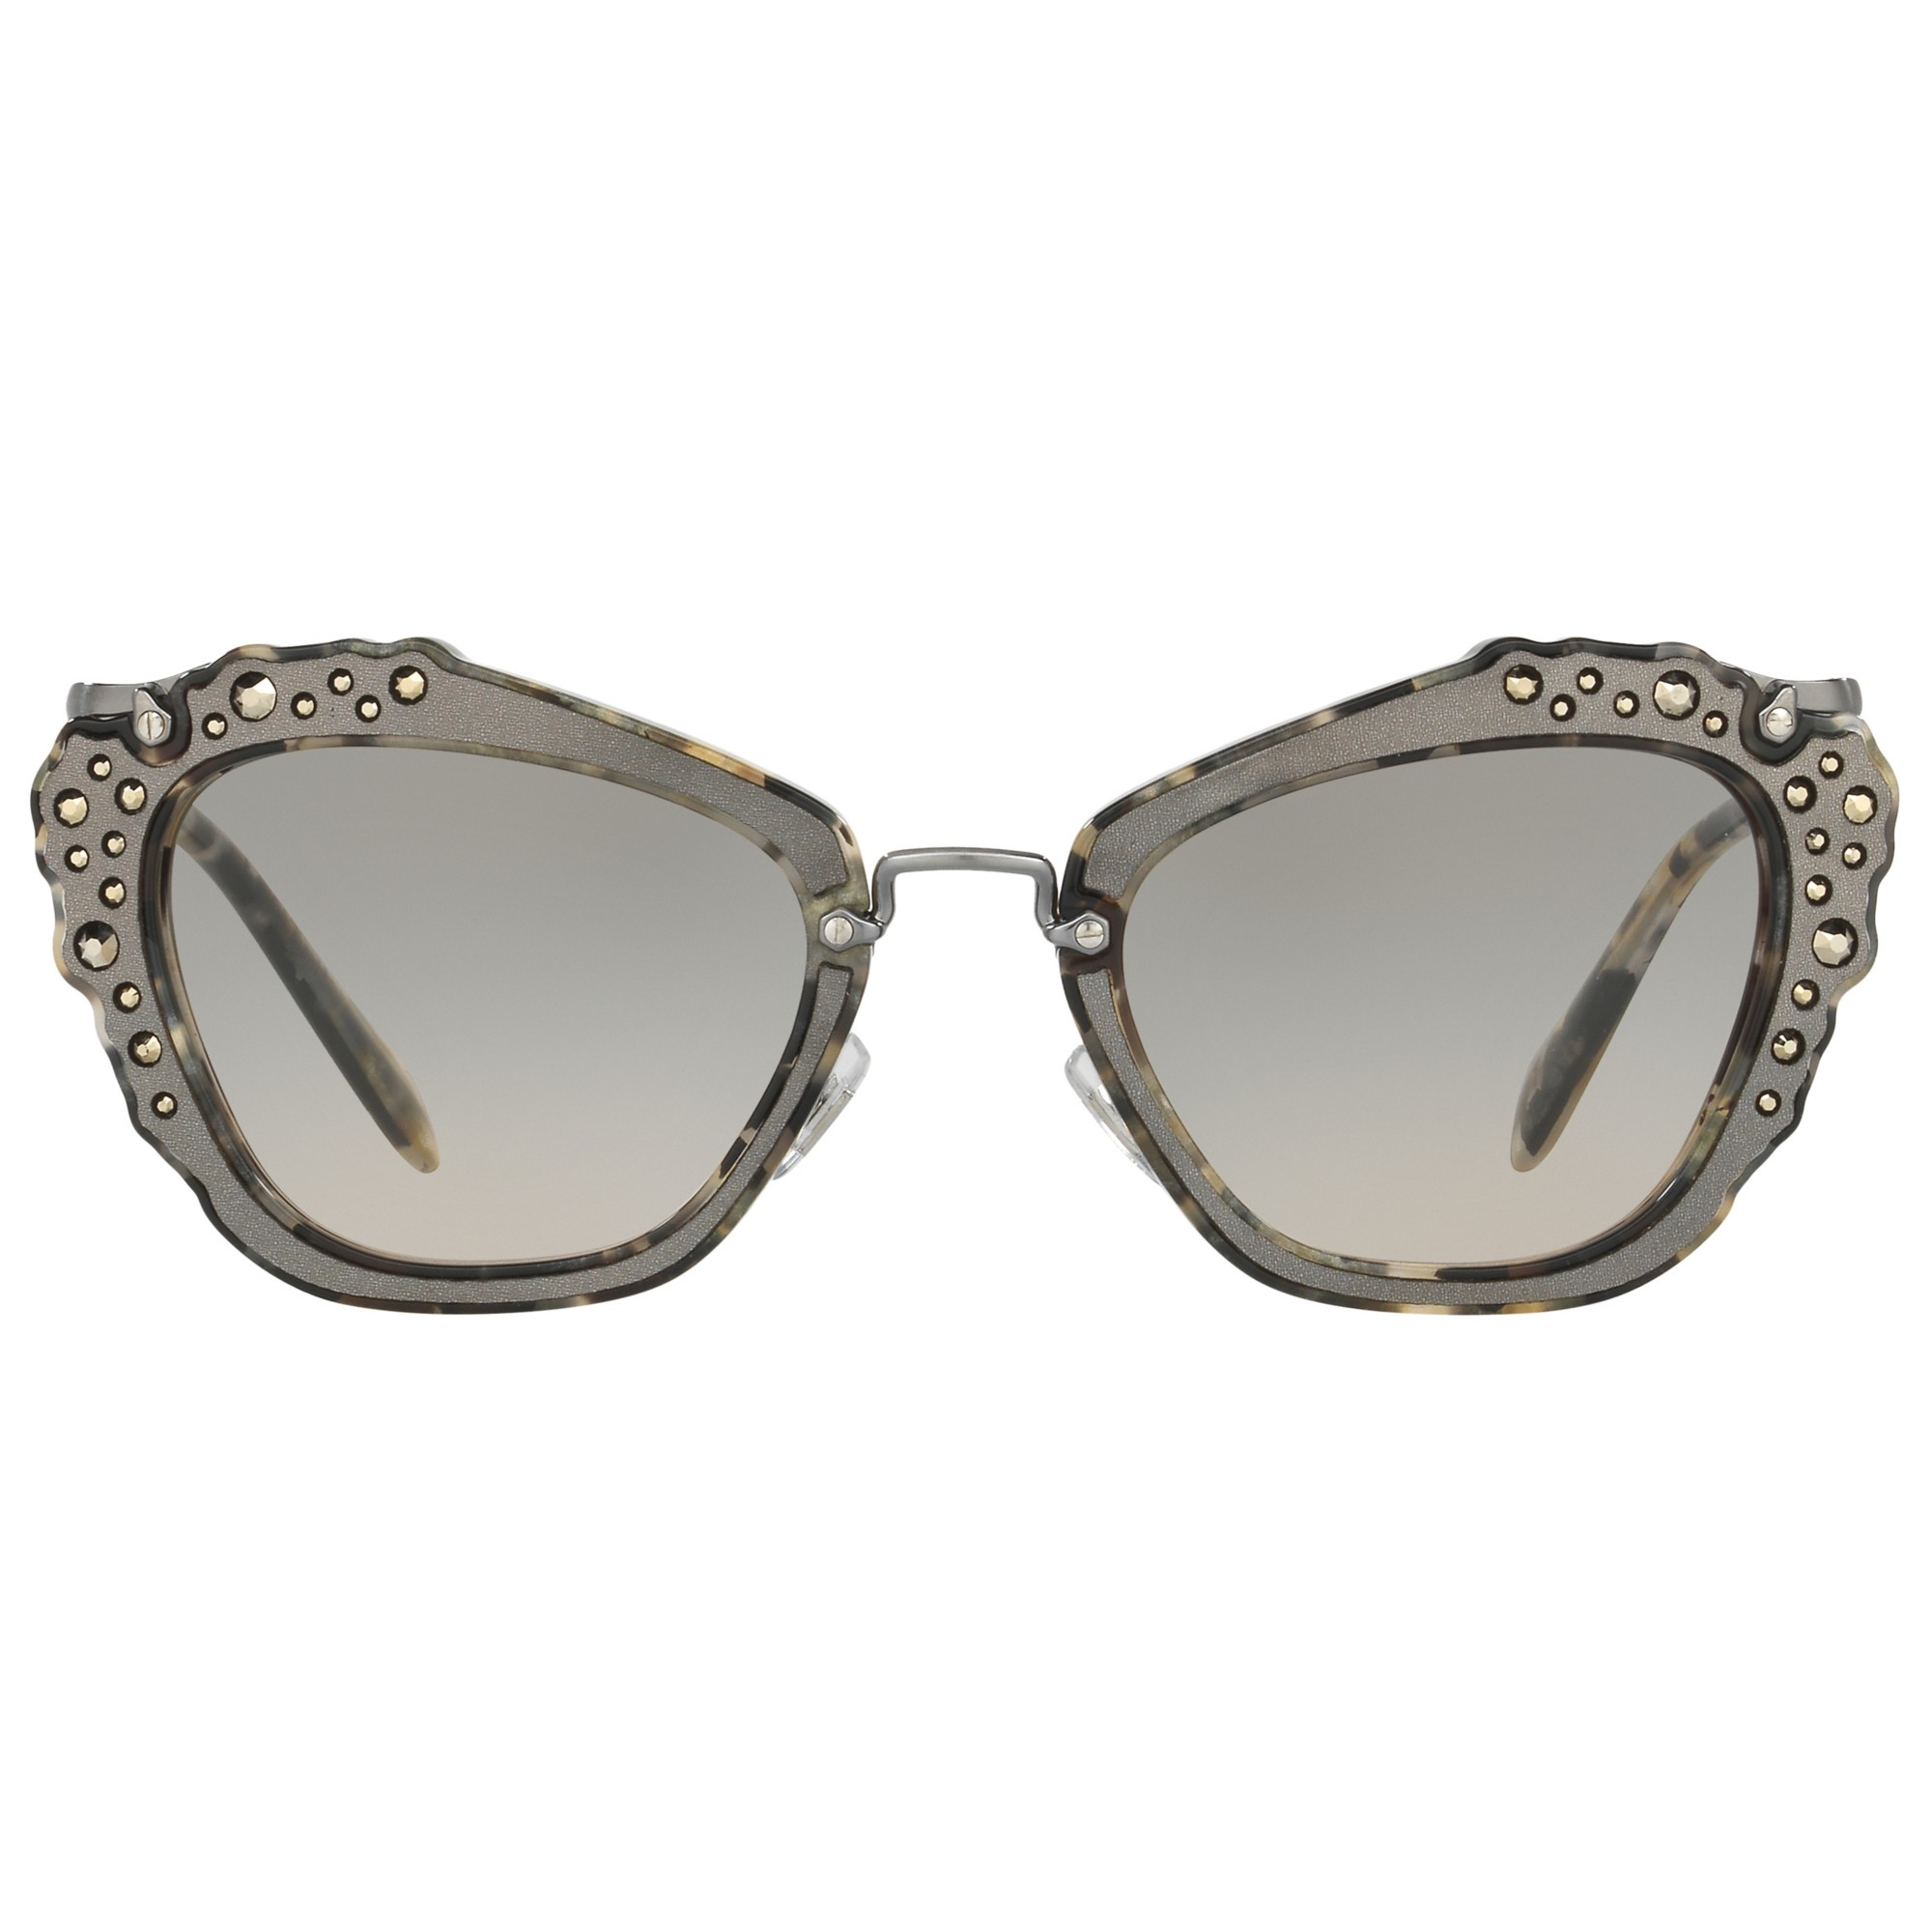 ee90a42aba Miu Miu Mu04qs Embellished Cat s Eye Sunglasses in Black - Lyst